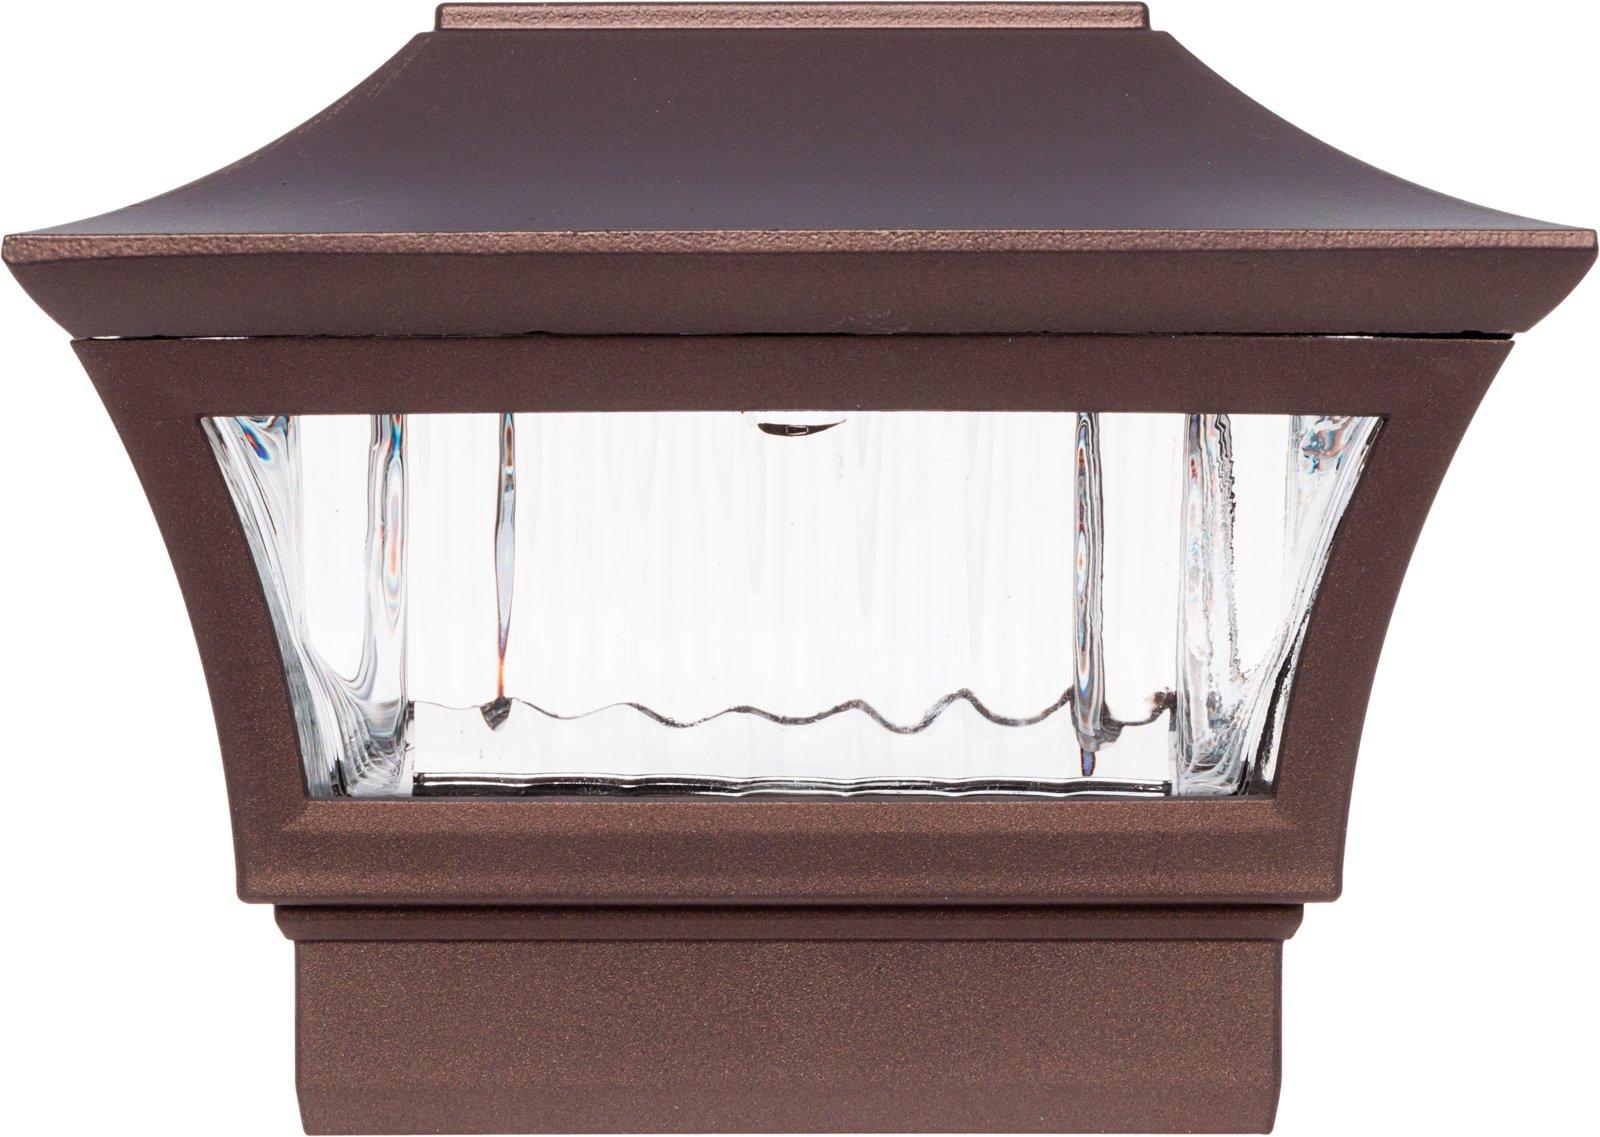 GreenLighting Aluminum Solar Post Cap Light - LED Light for 4 x 4 Wood or 5 x 5 PVC Posts (Bronze)